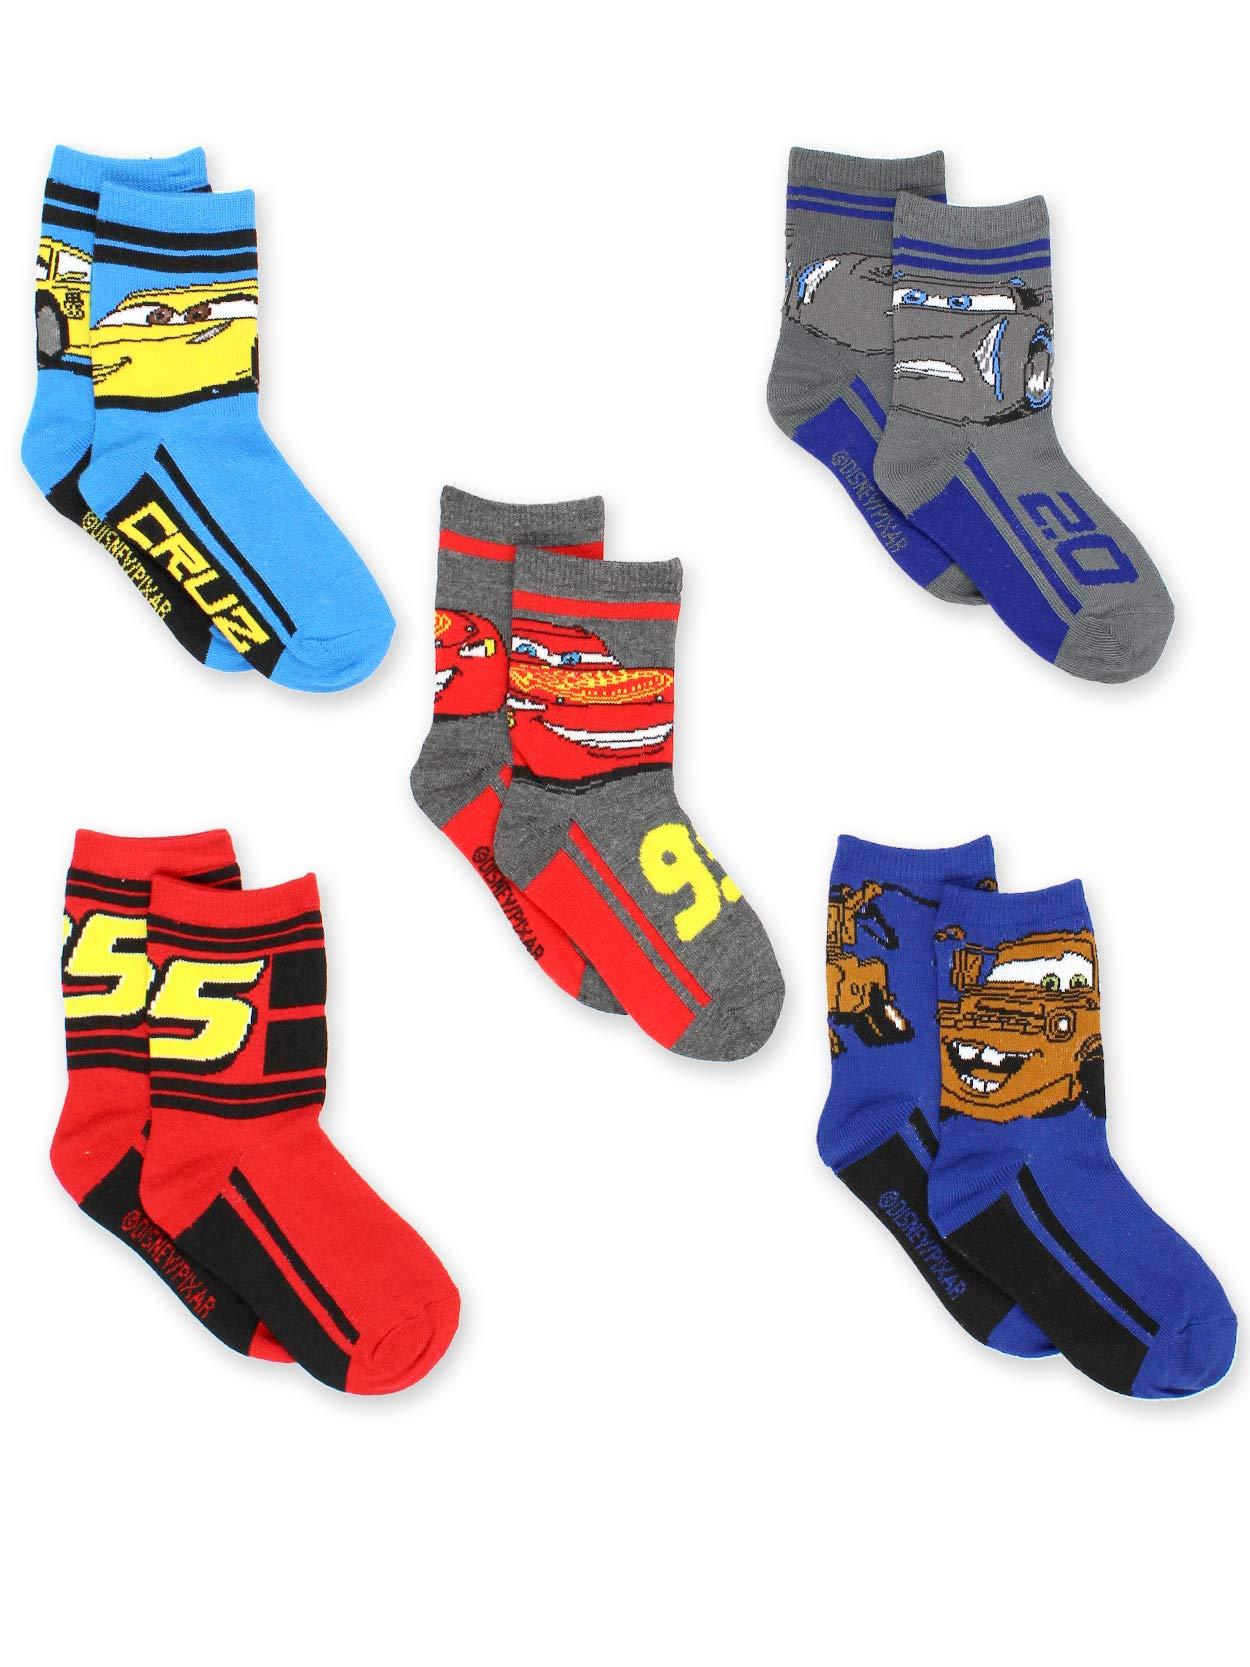 Disney Cars 3 Boys Toddler 5 pack Crew Socks (4-6 Toddler (Shoe: 7-10), Grey/Multi Crew)